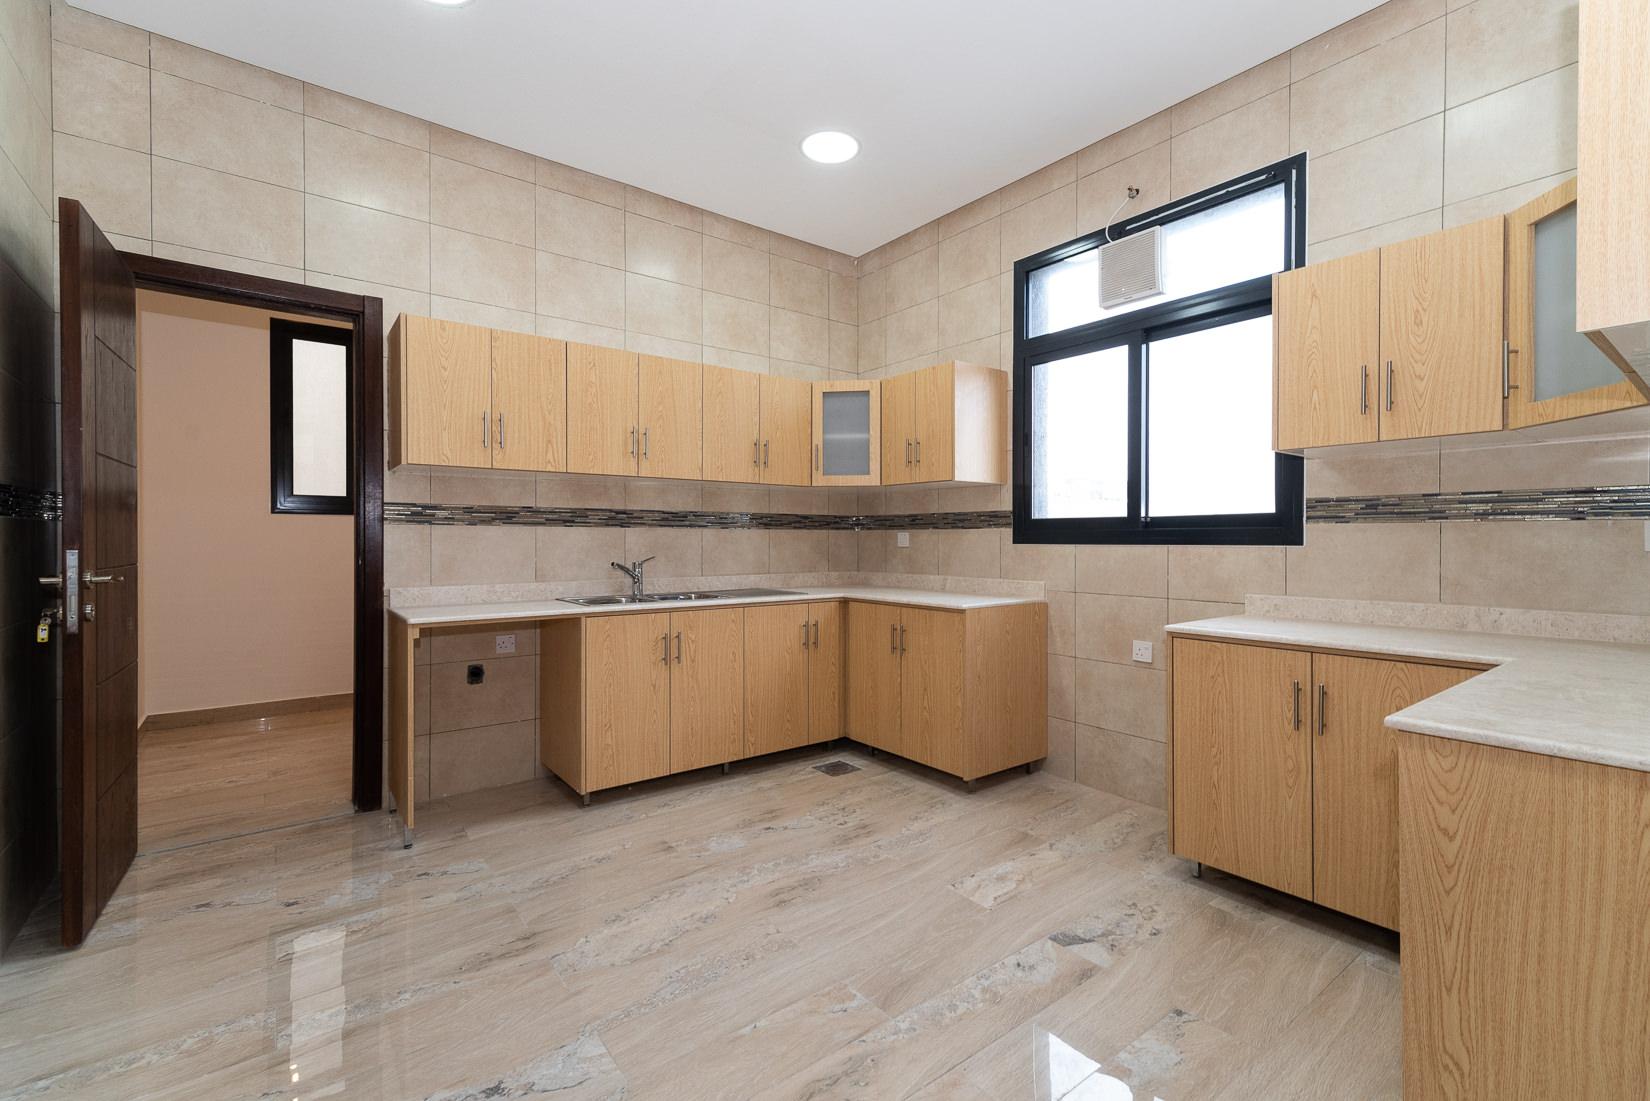 Fnaitees – new, three bedroom duplex apartment